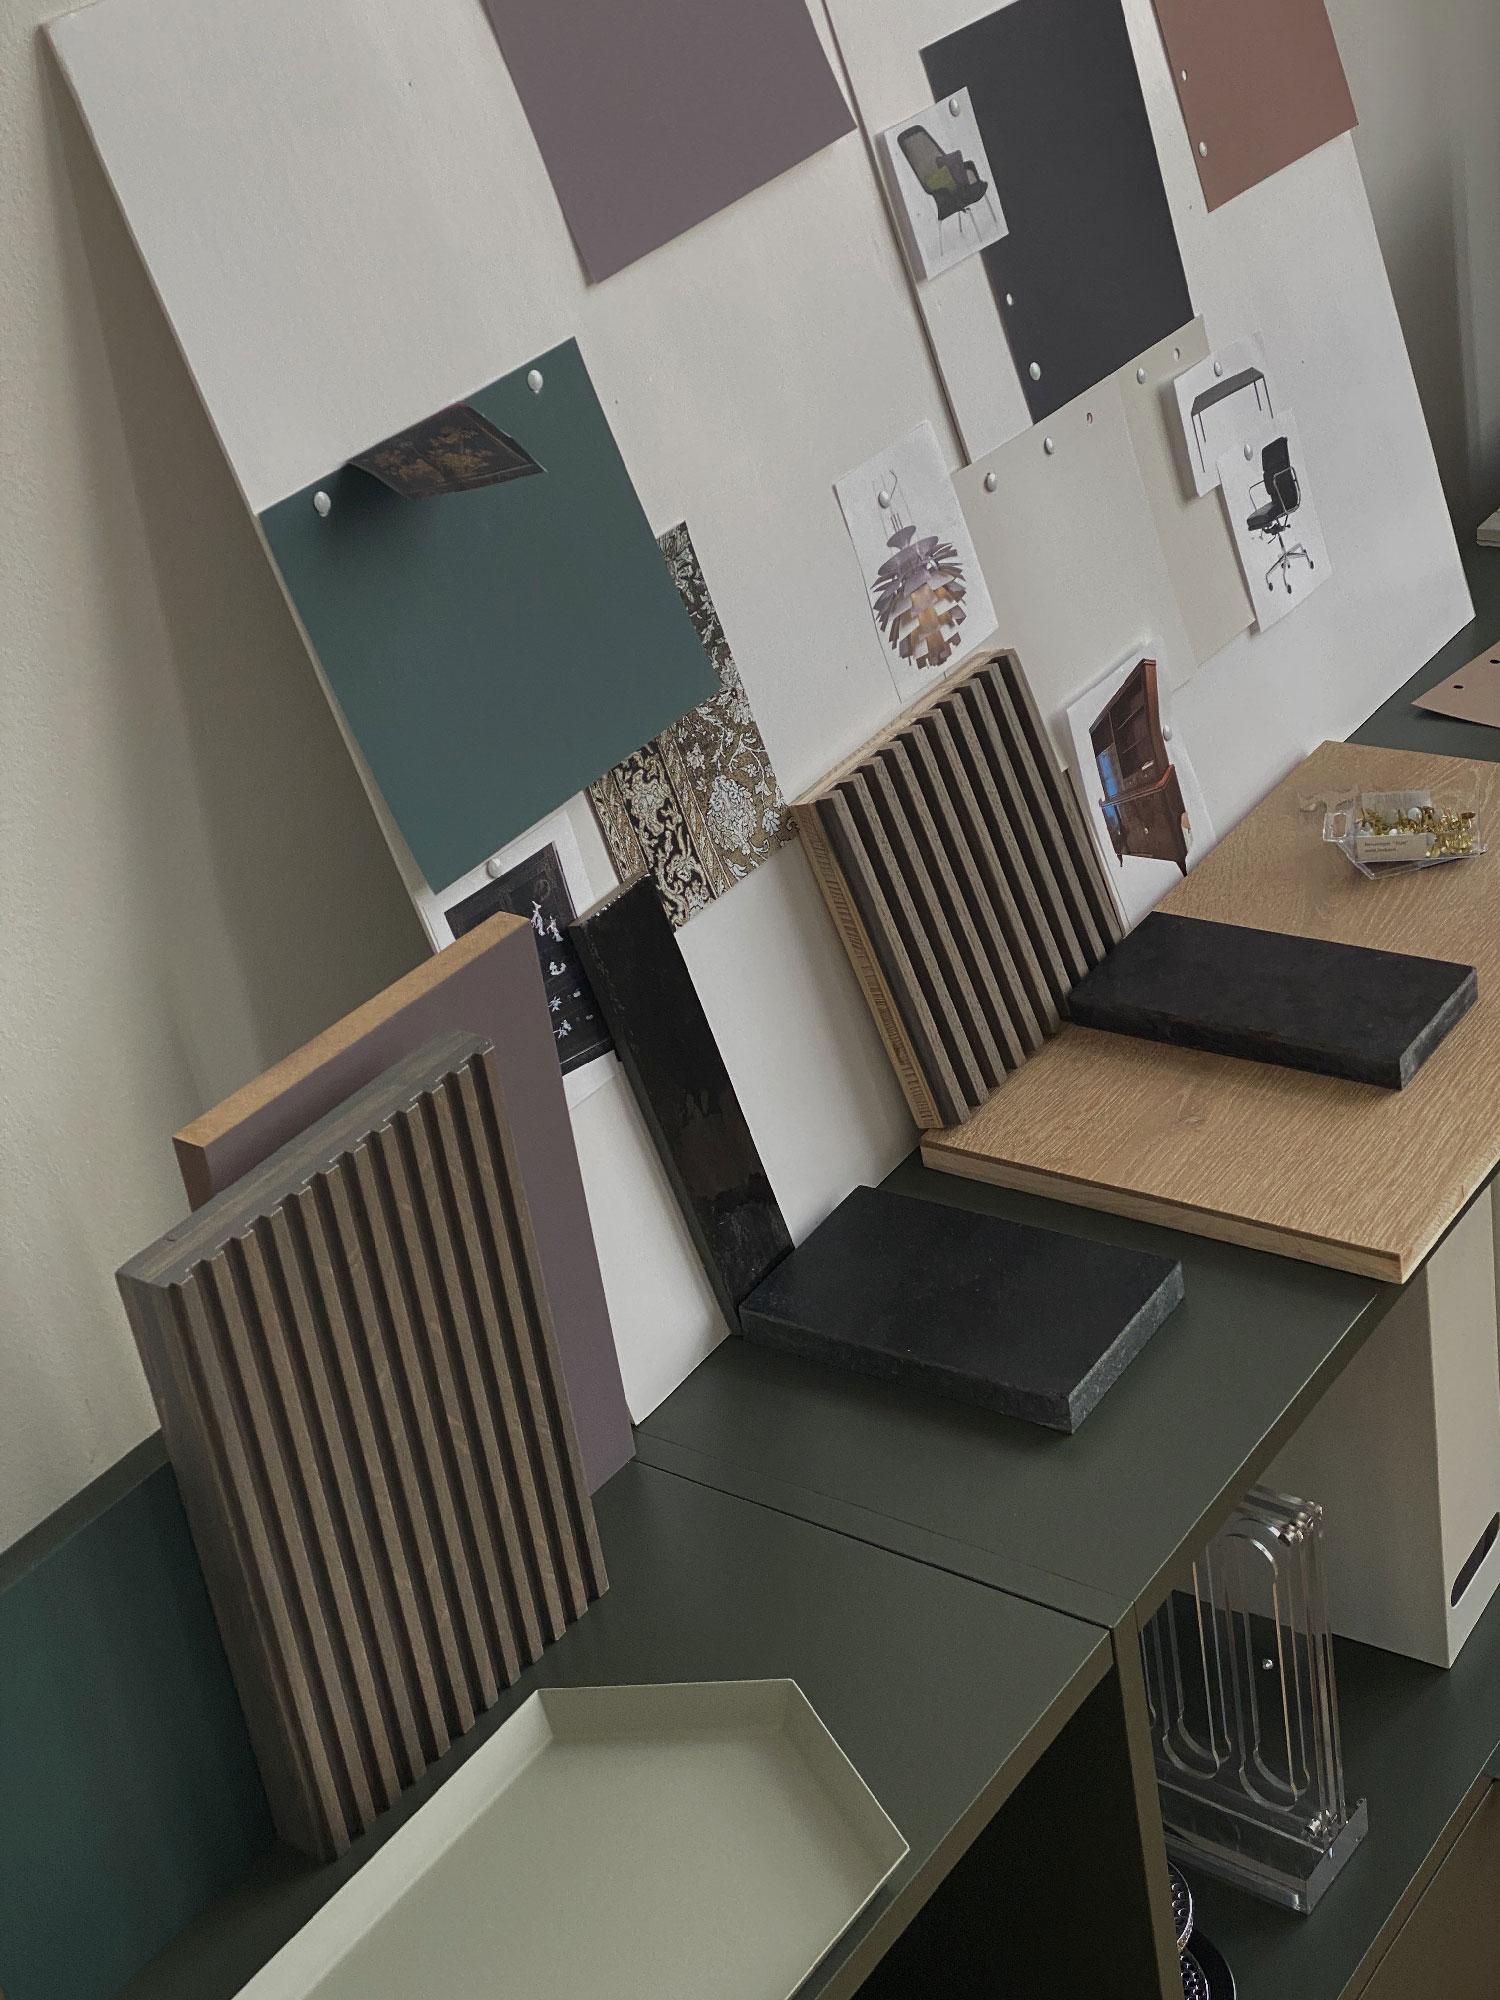 moodboard interior design - www.lesfactoryfemmes.com